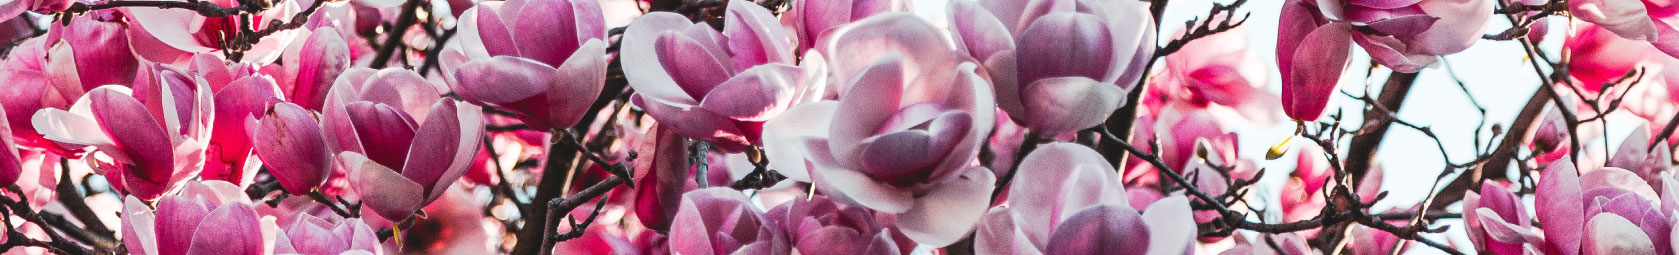 Rosa blühender Baum